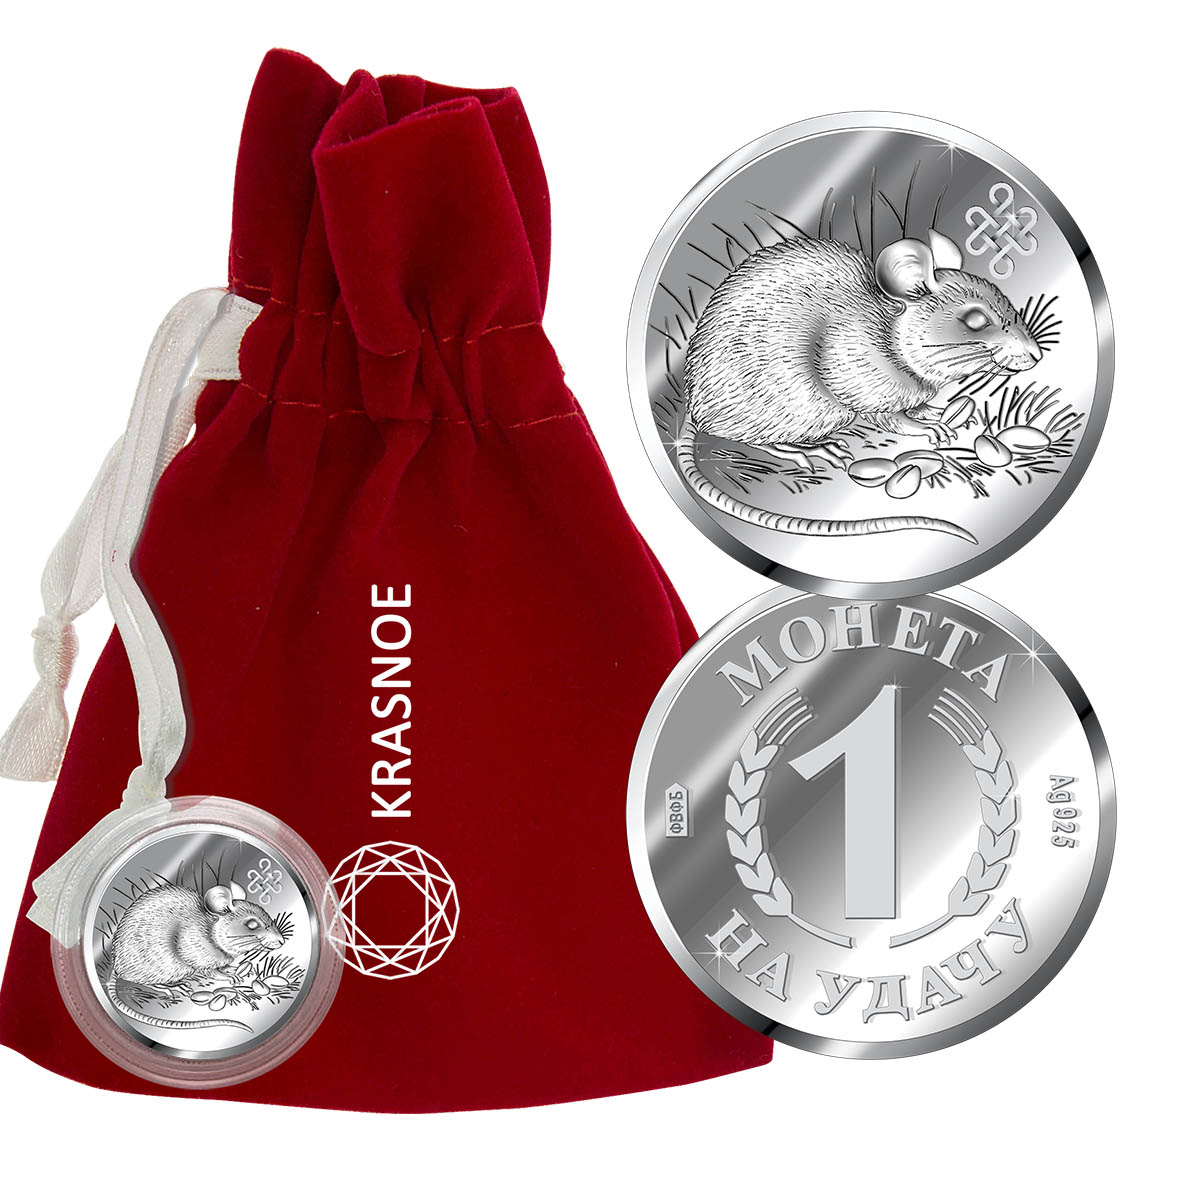 Серебряная монета арт. 9300409022 9300409022